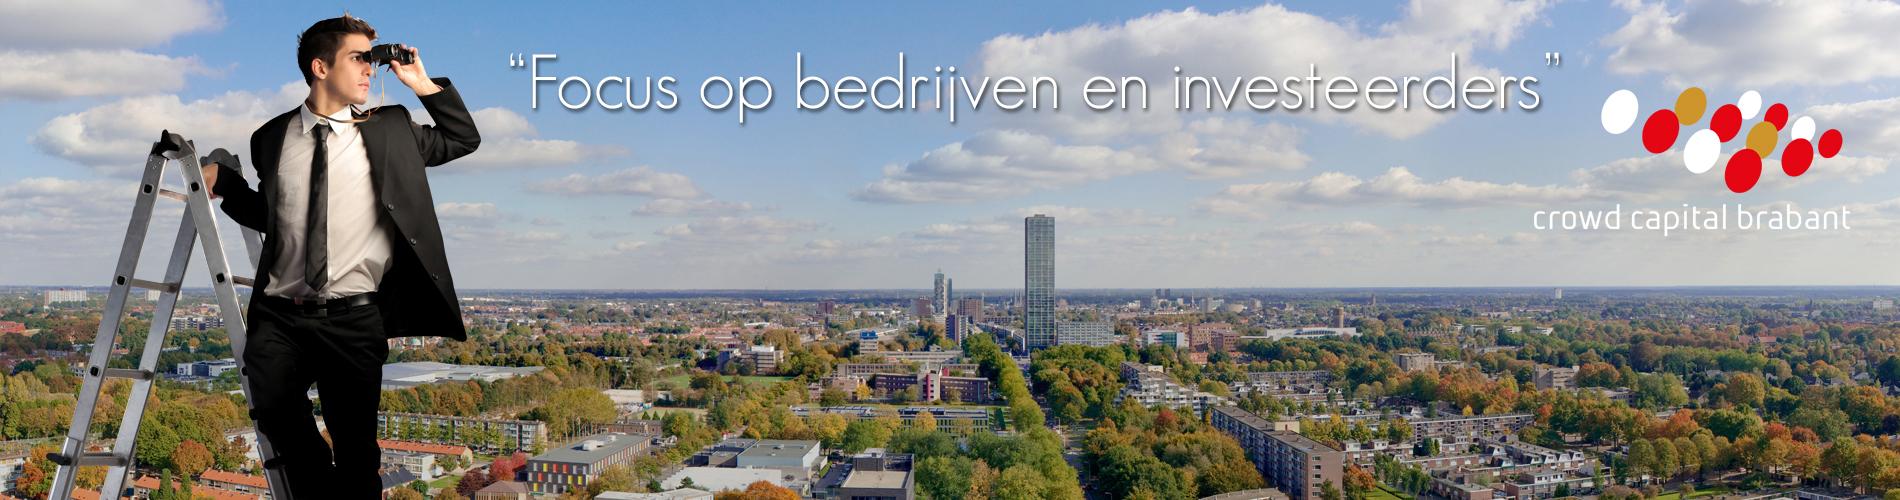 Crowd Capital Brabant